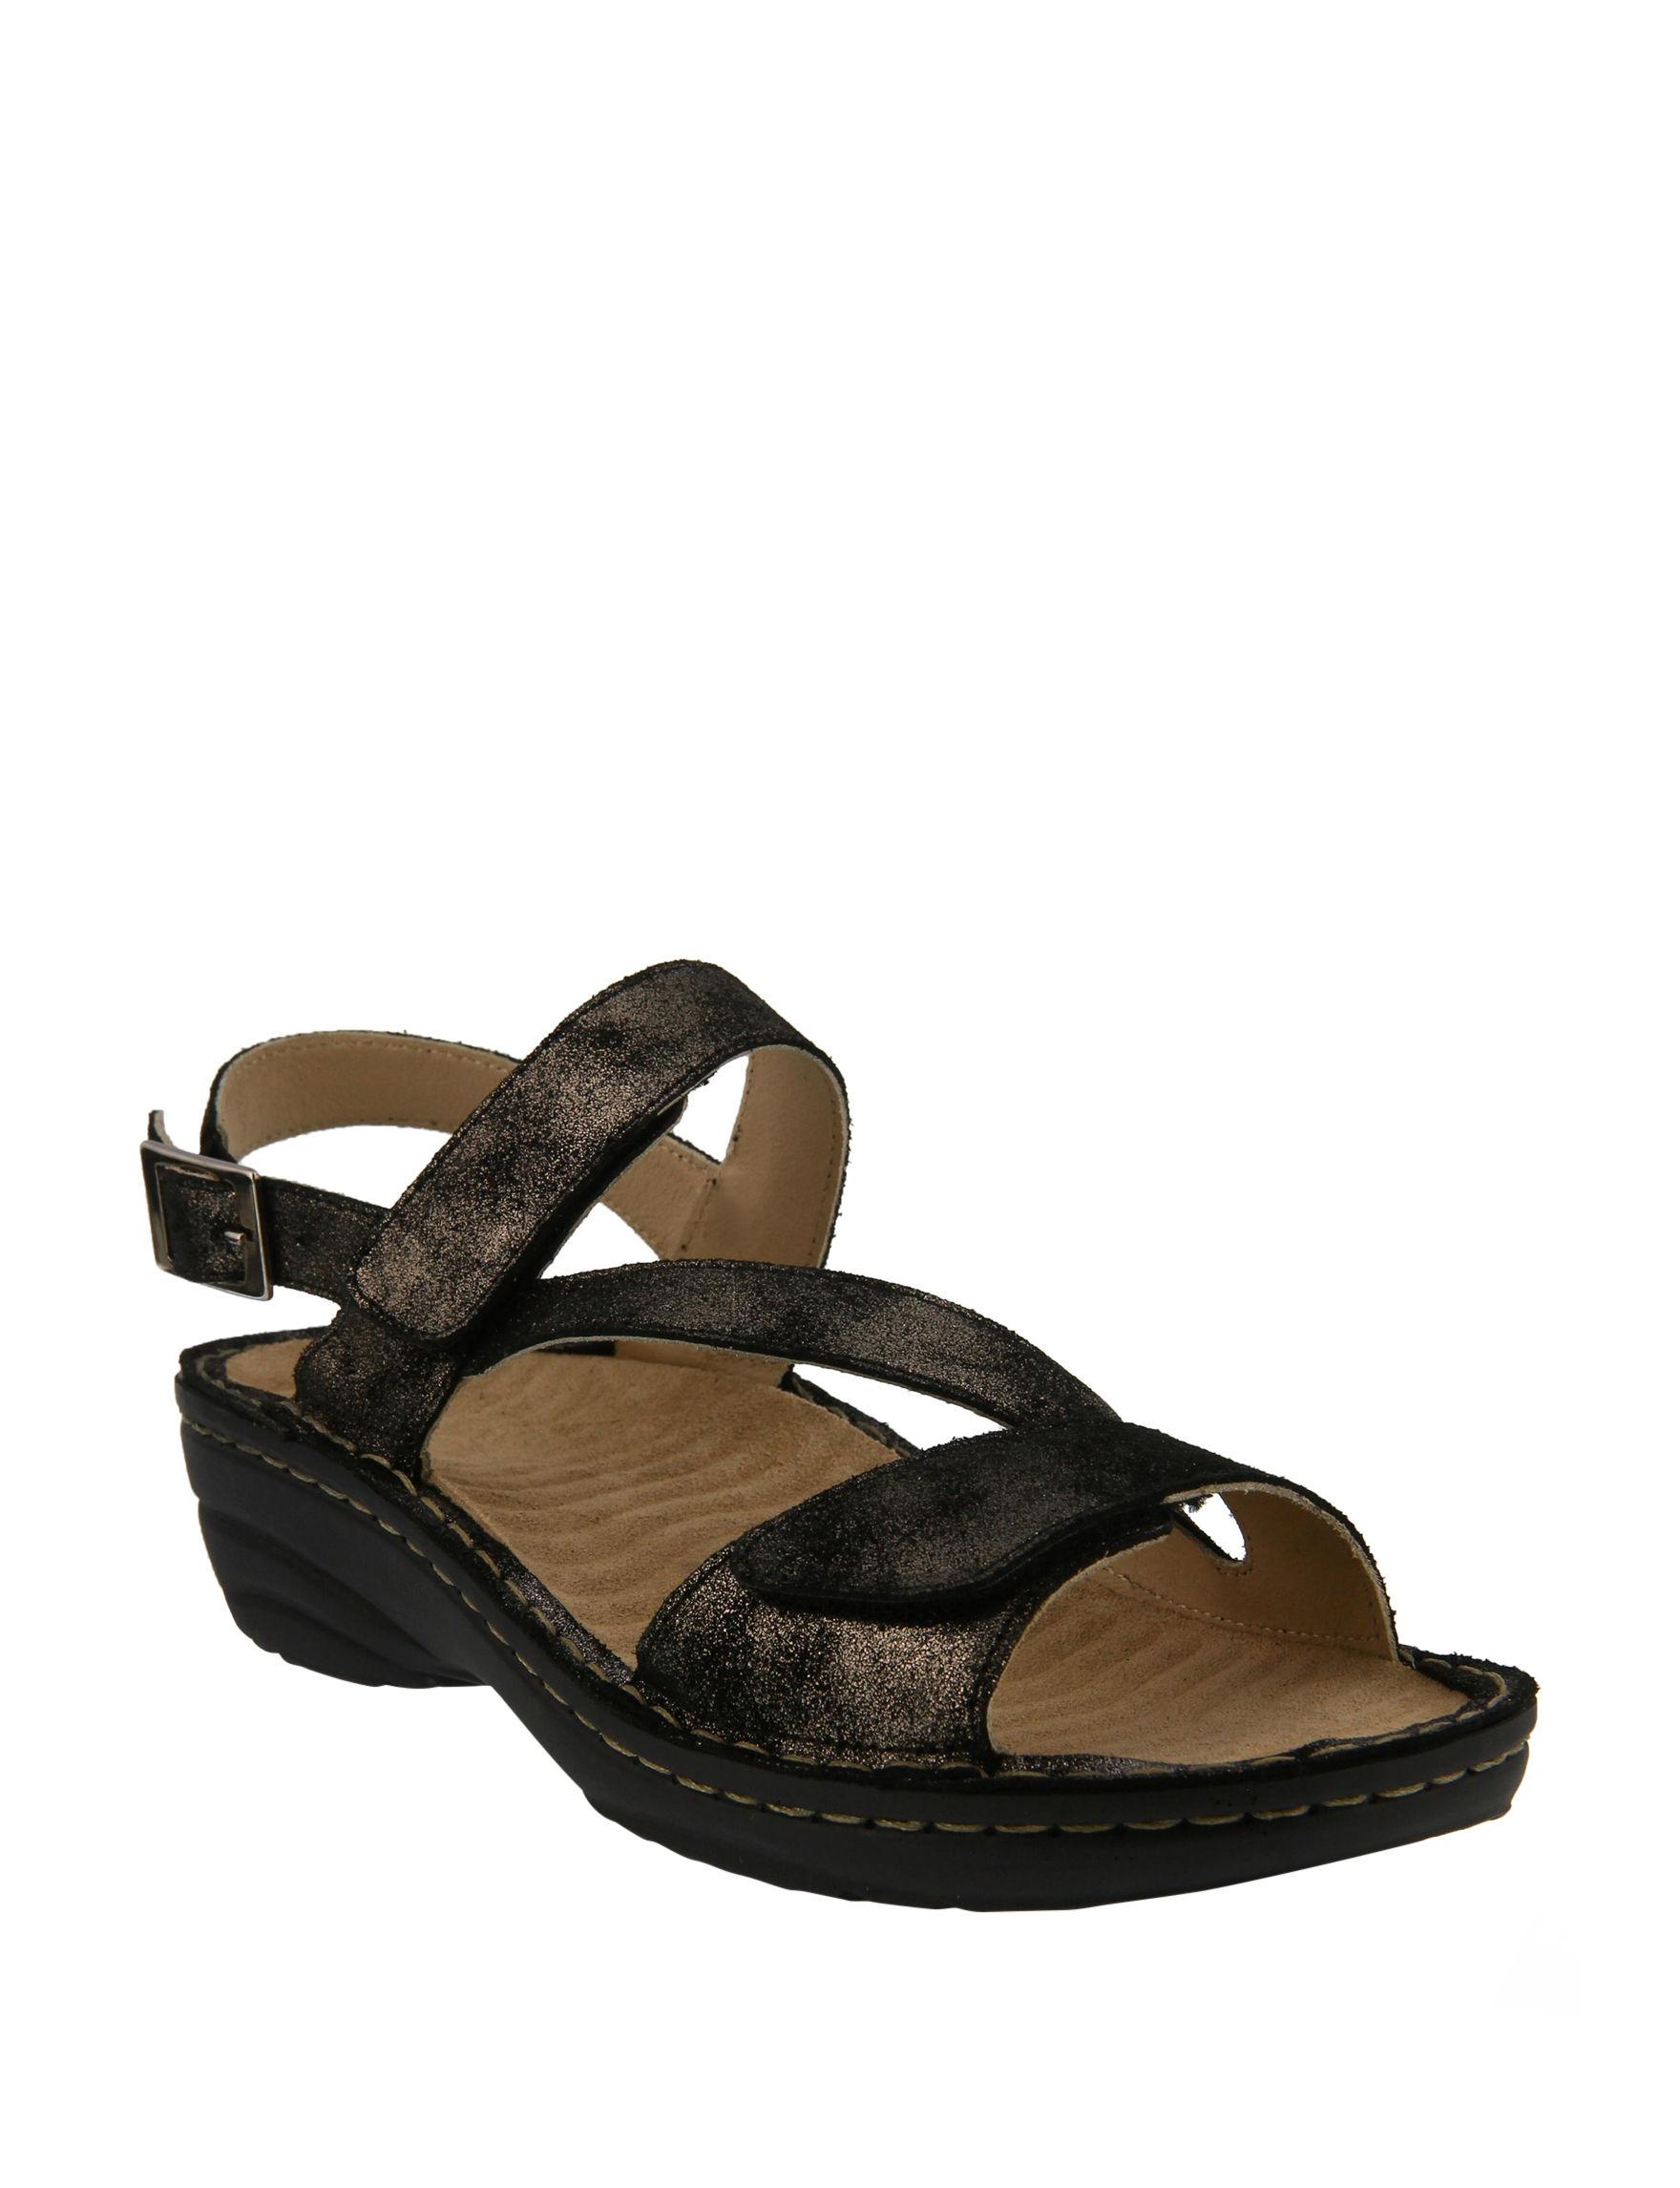 Spring Step Black Wedge Sandals